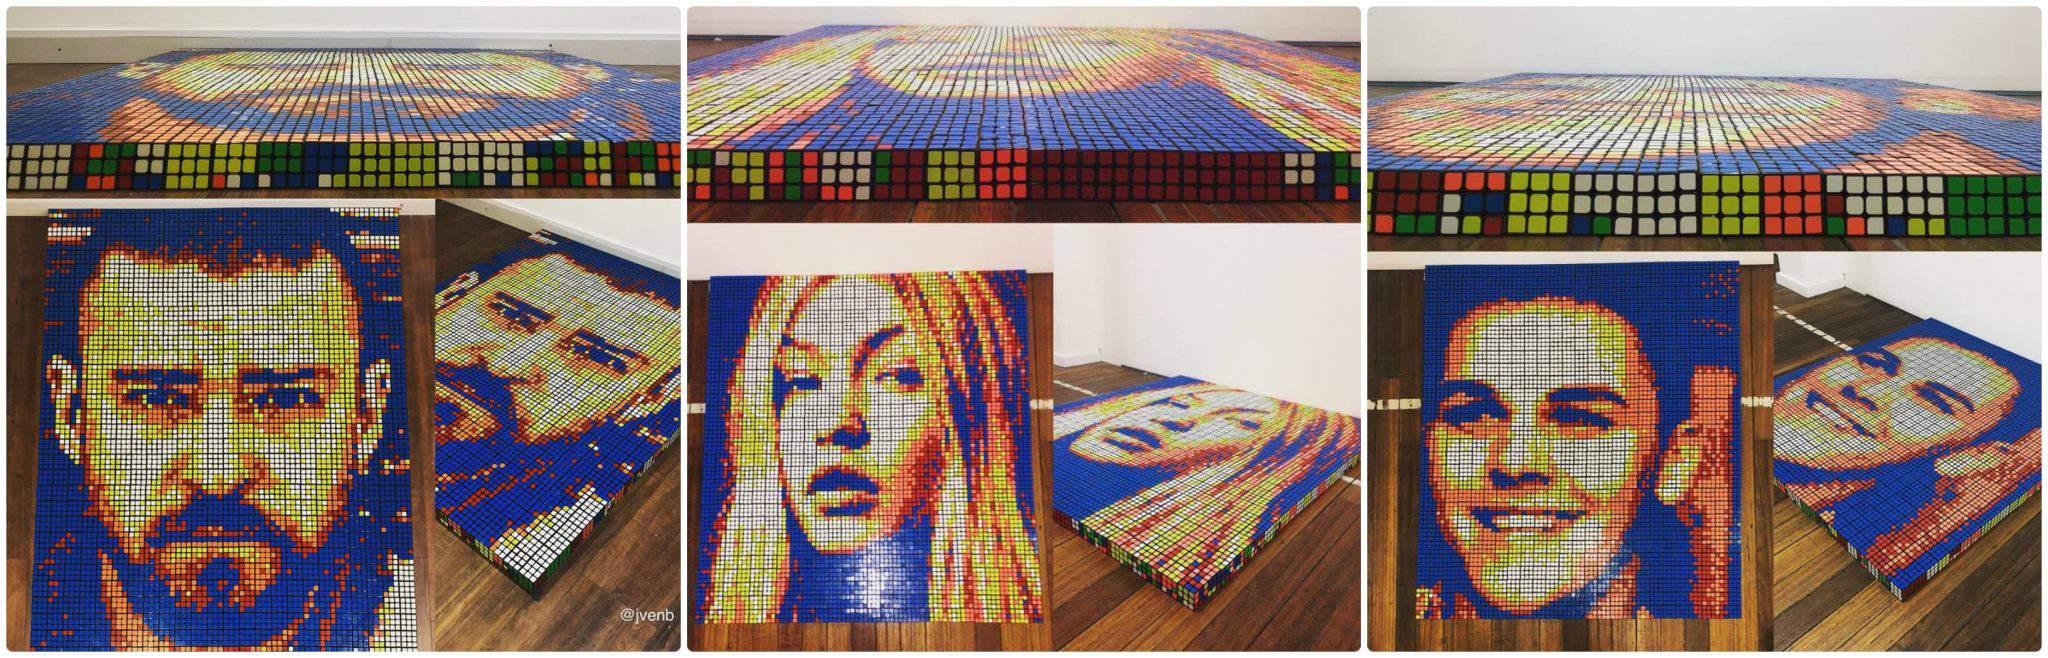 Rubik's Cube artist